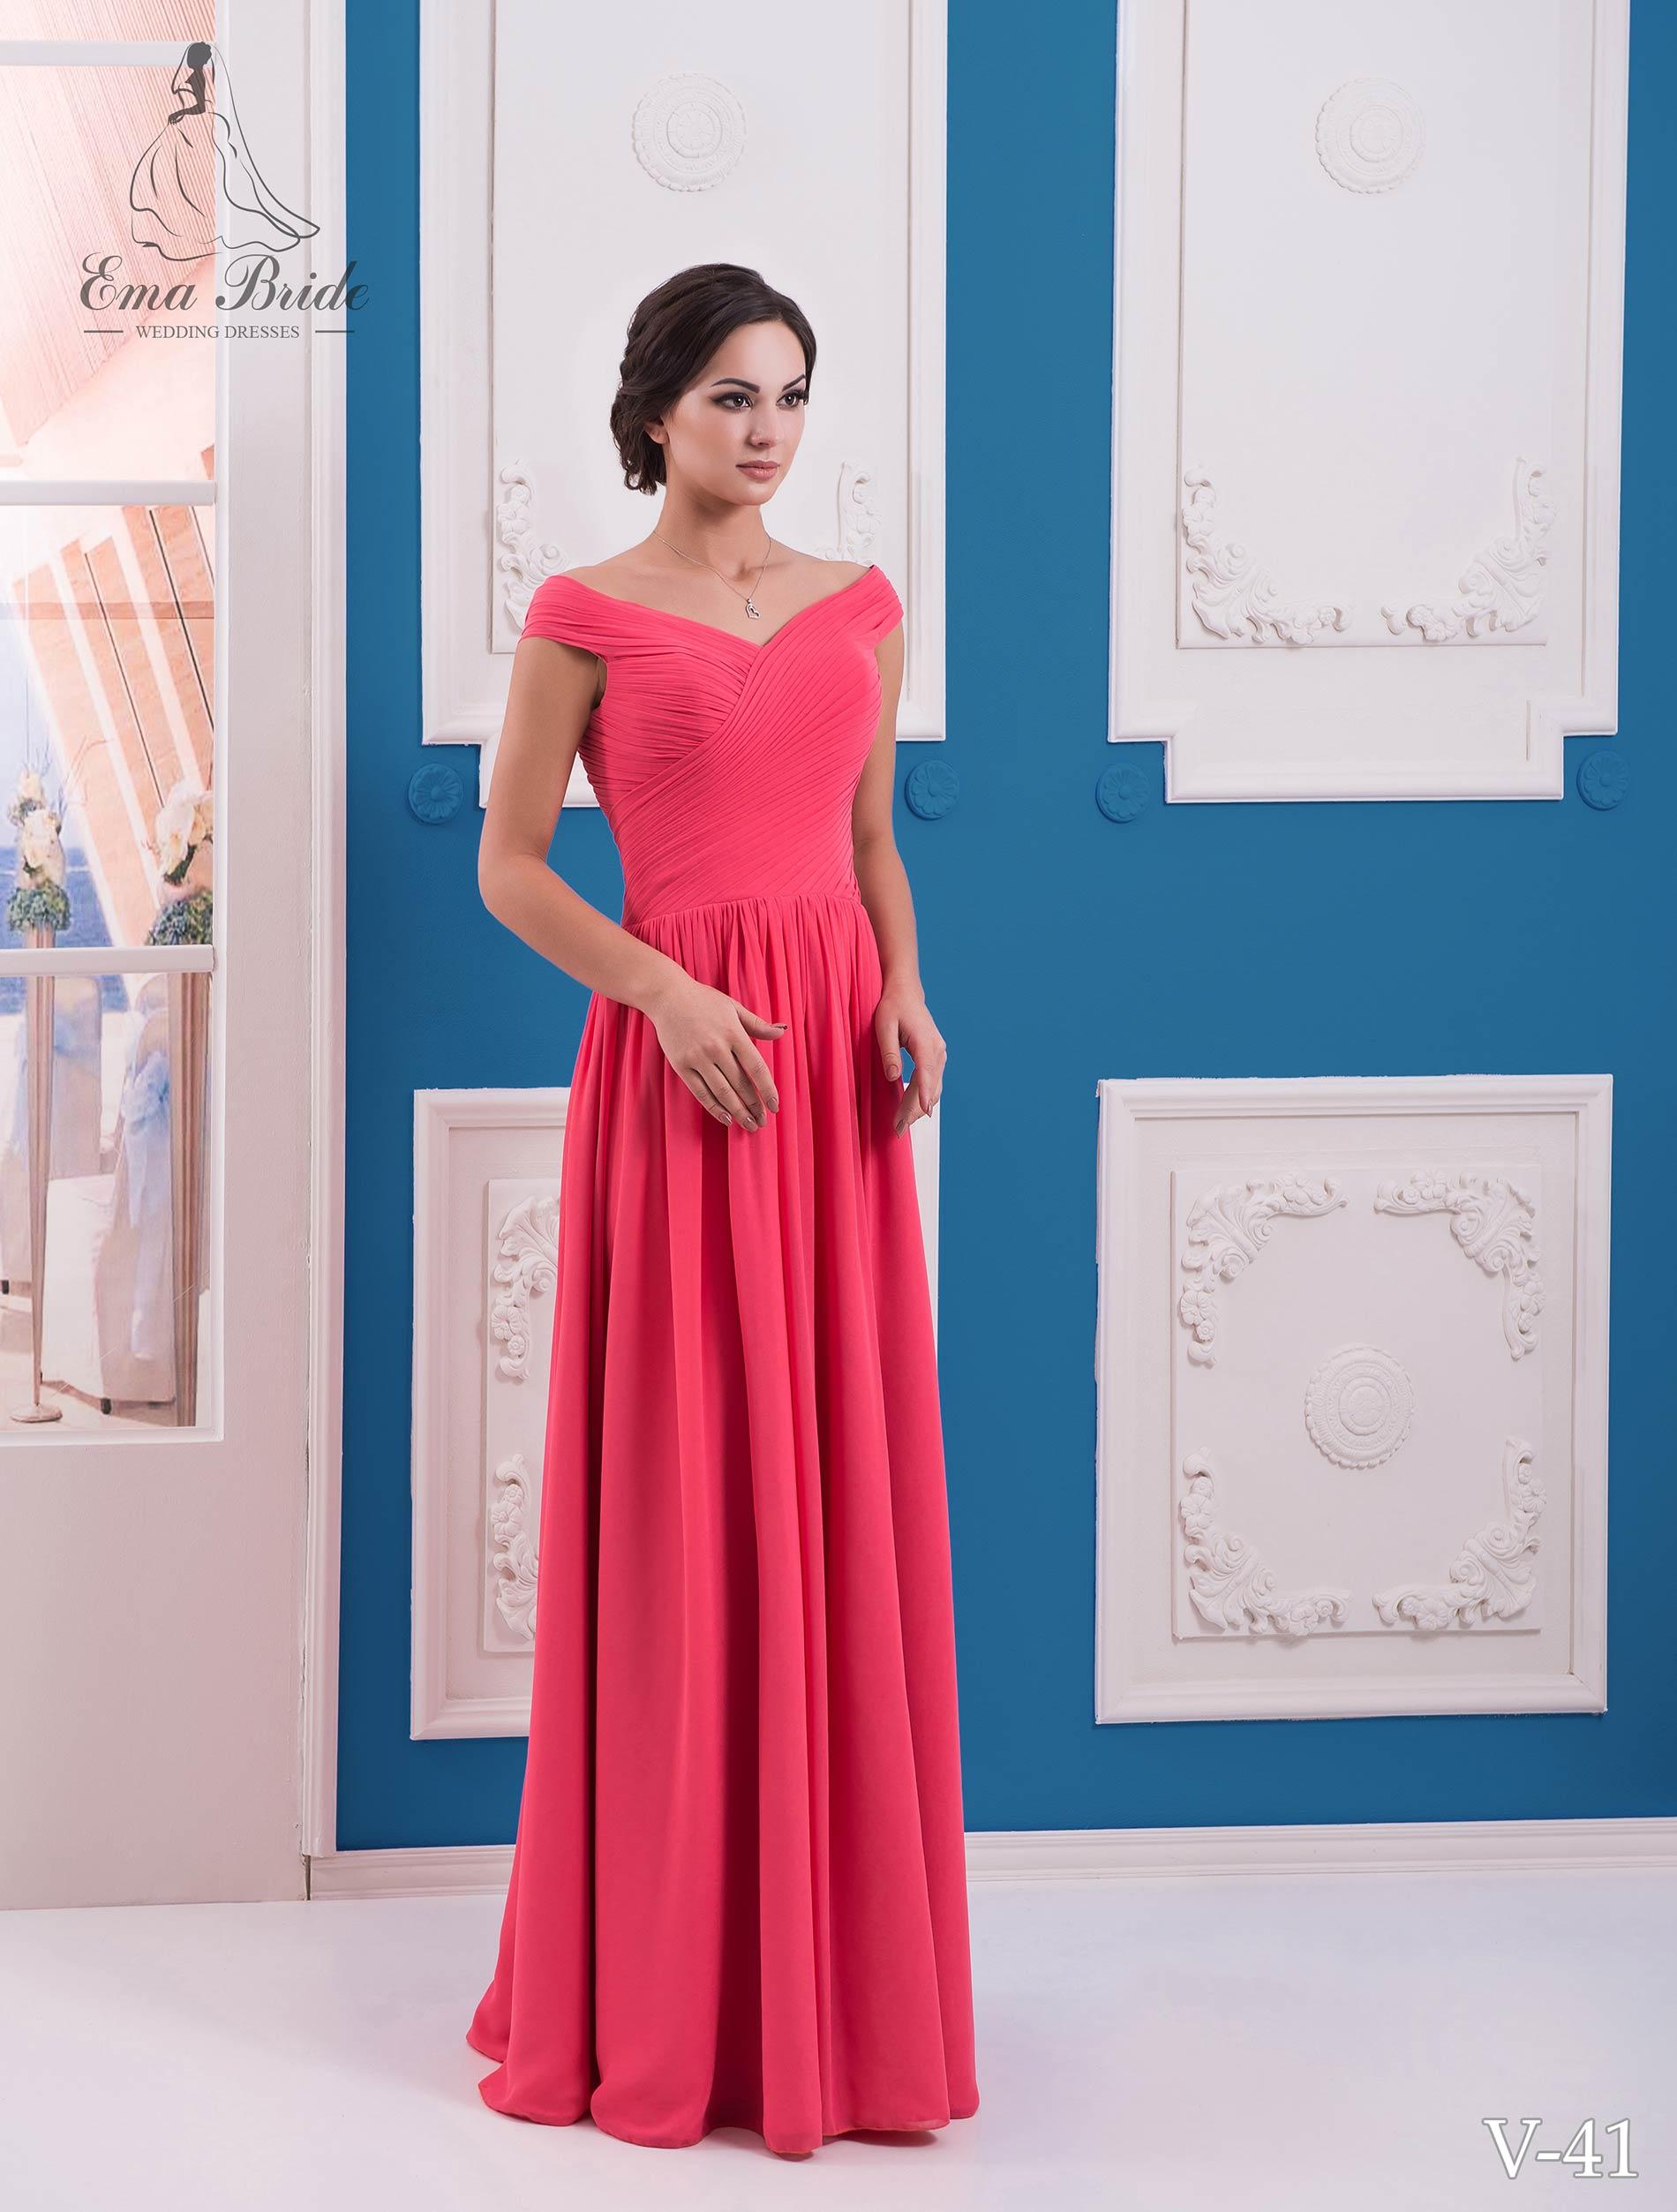 Evening dress v-41 on wholesale